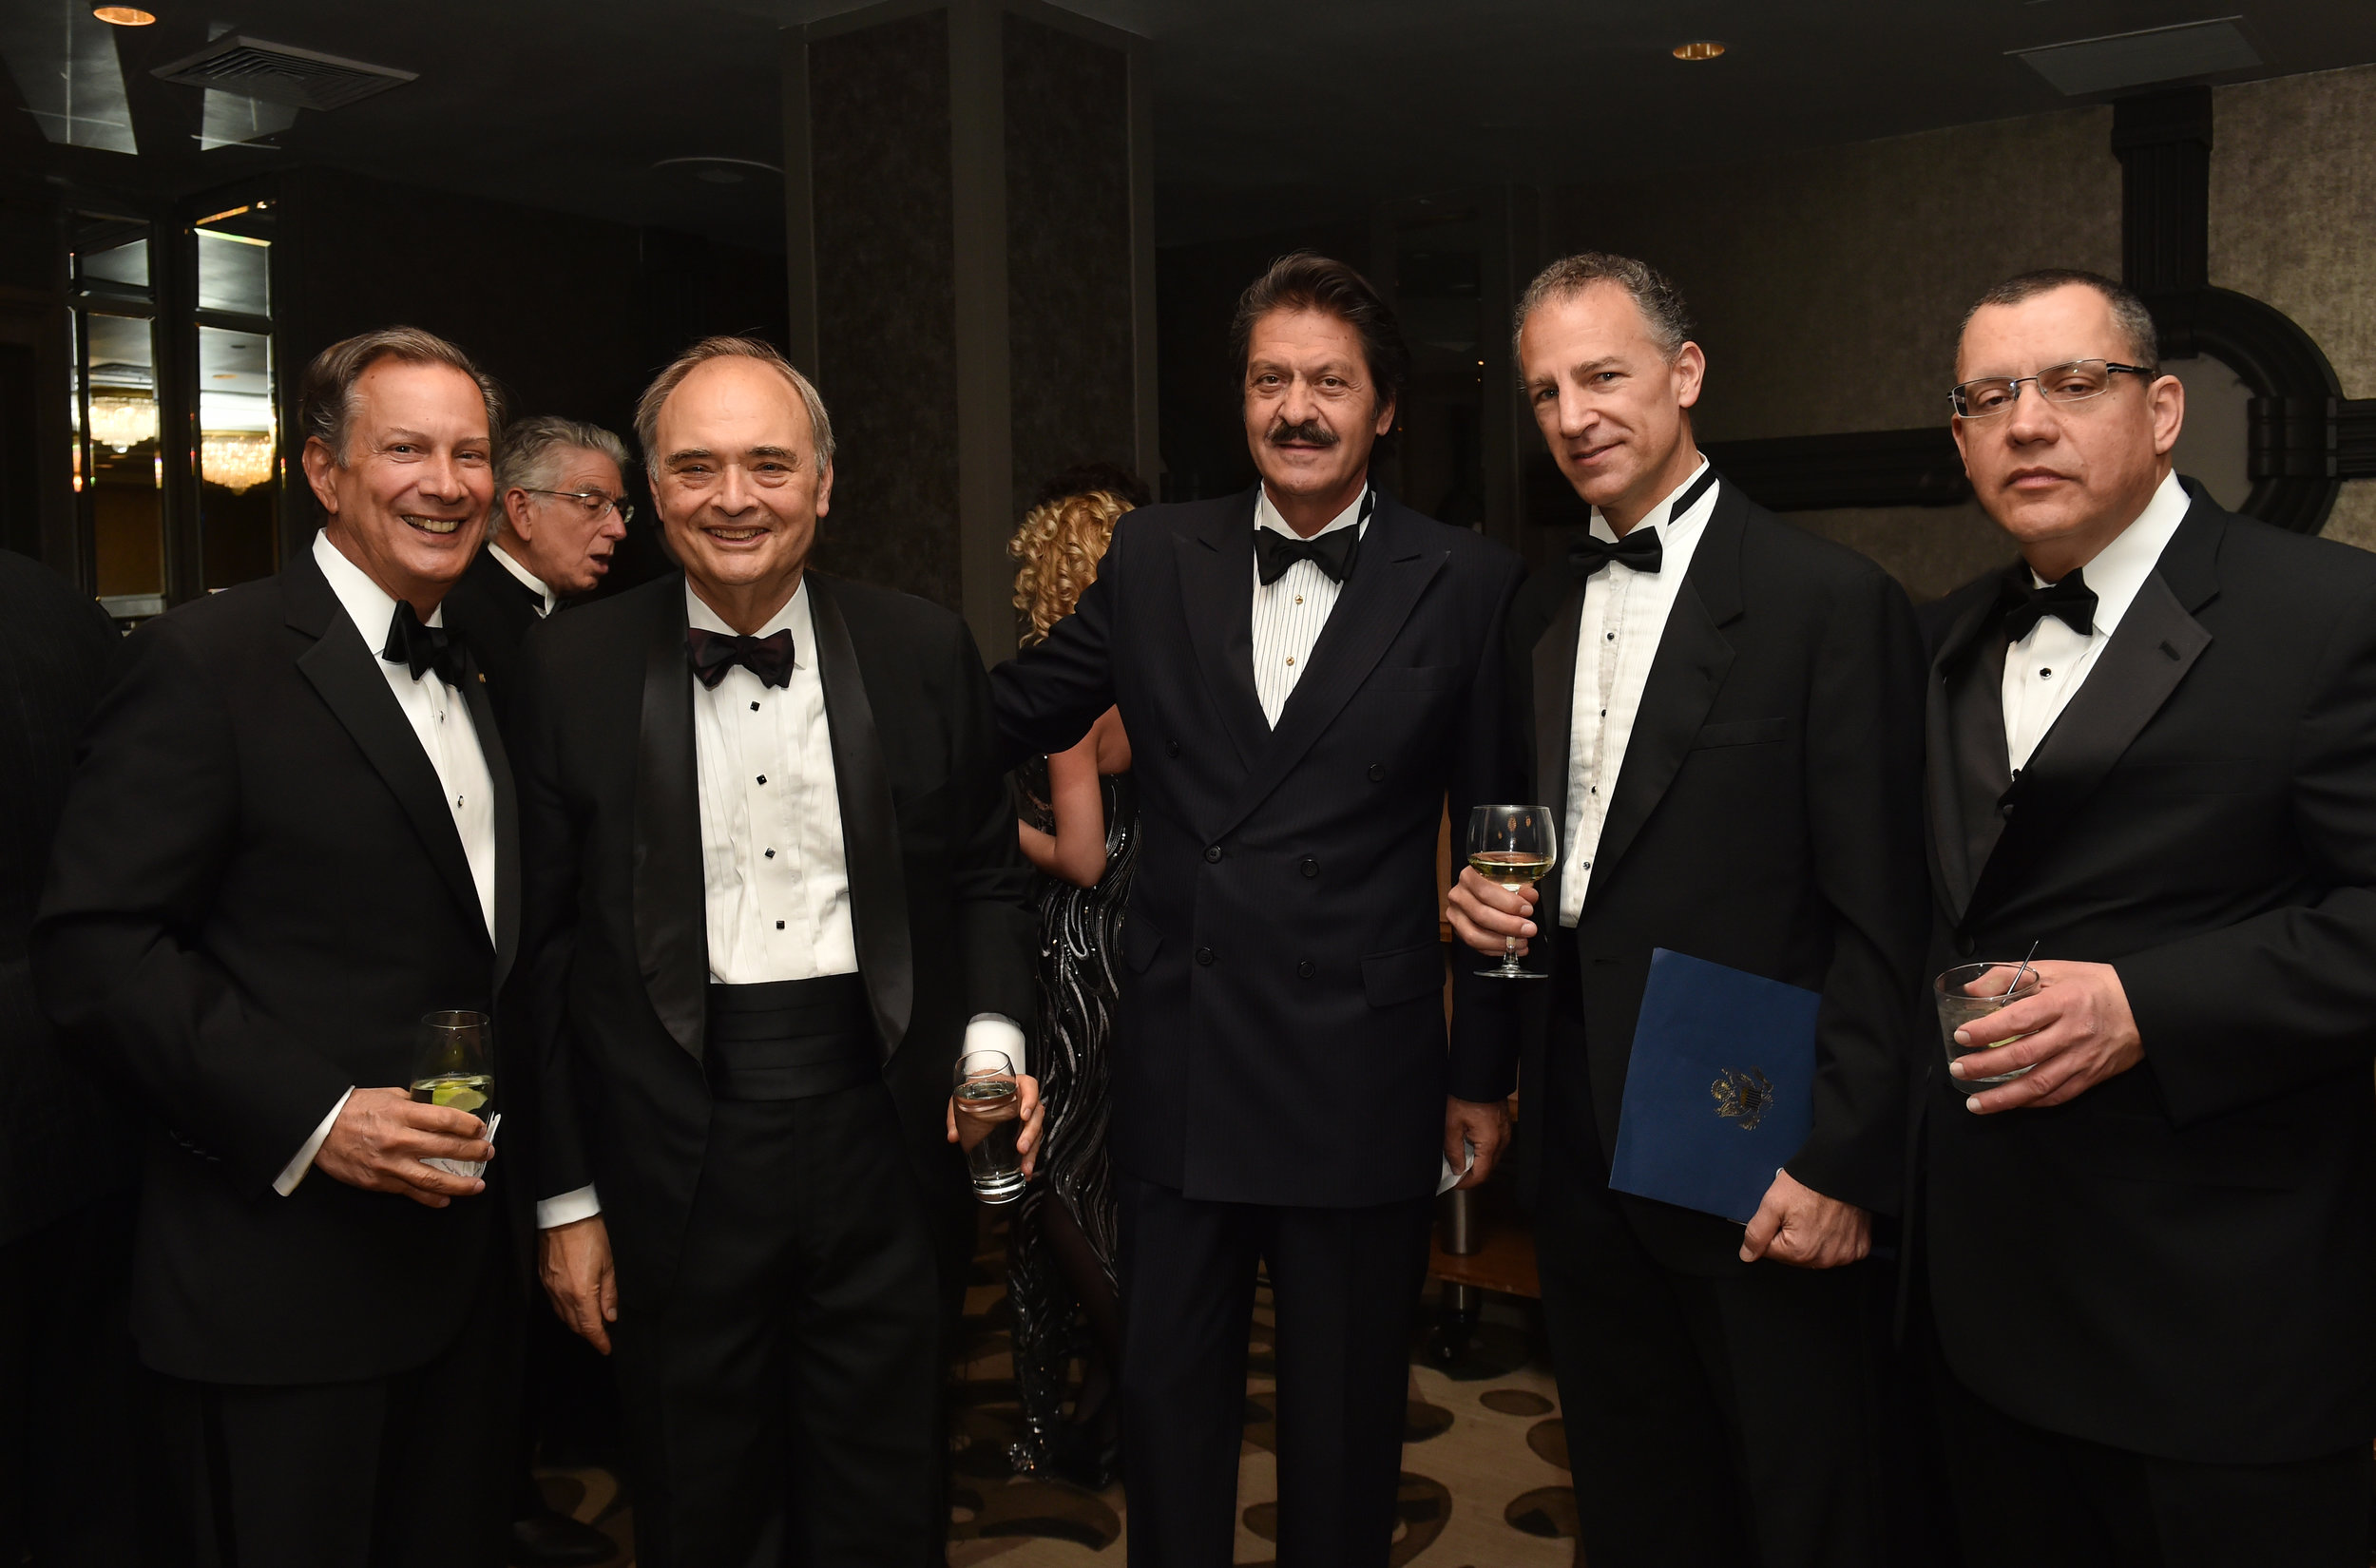 (L-R) AHI Board Member Leon Andris, Manny Rouvelas, Partner, K&L Gates; AHI Board Member Kosta Alexakis, Deputy Assistant Secretary Jonathan Cohen, Constantine Larigakis.